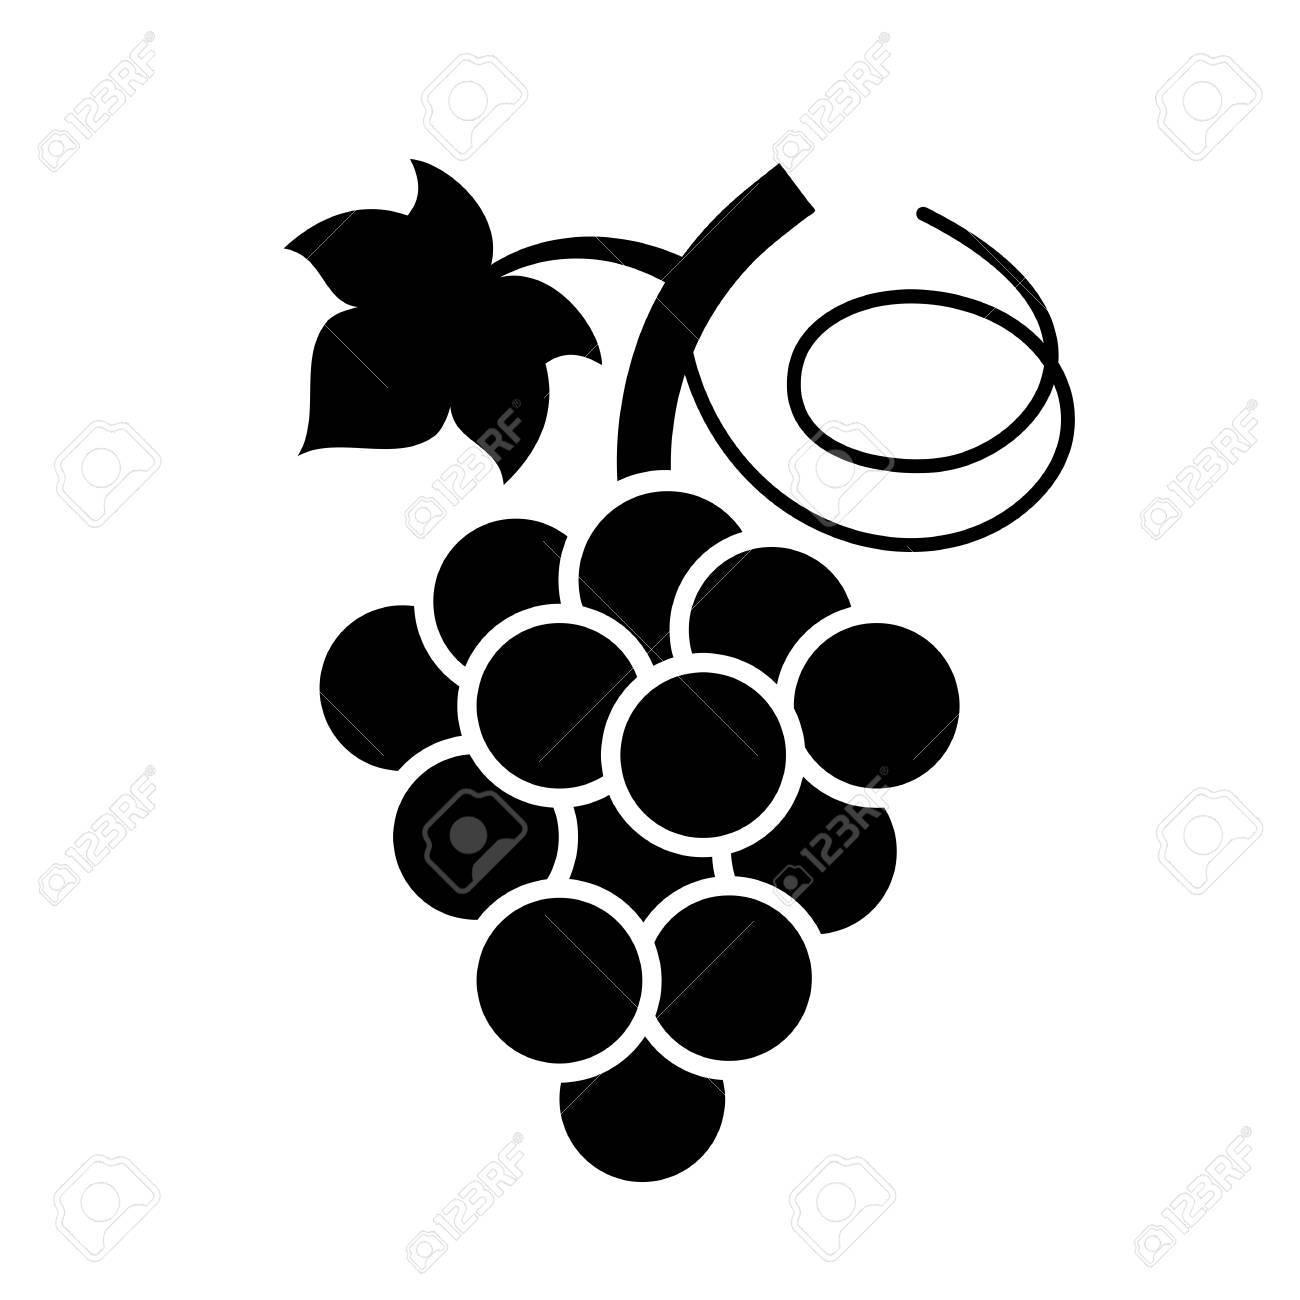 bunch of grapes vector icon royalty free cliparts vectors and rh 123rf com grape vector png graph vectors desmos